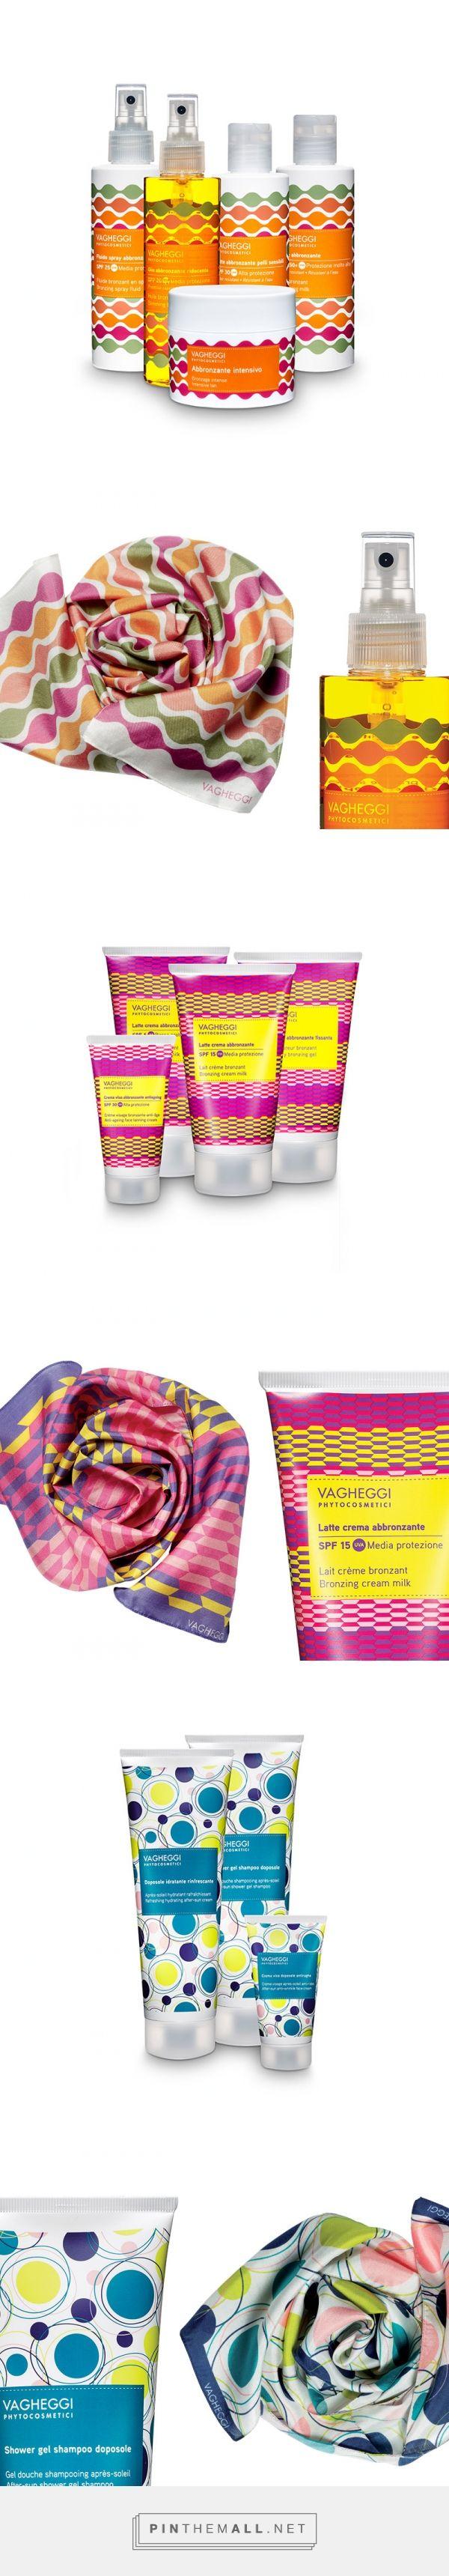 Vagheggi – Packaging Happy Sun | Weagroup